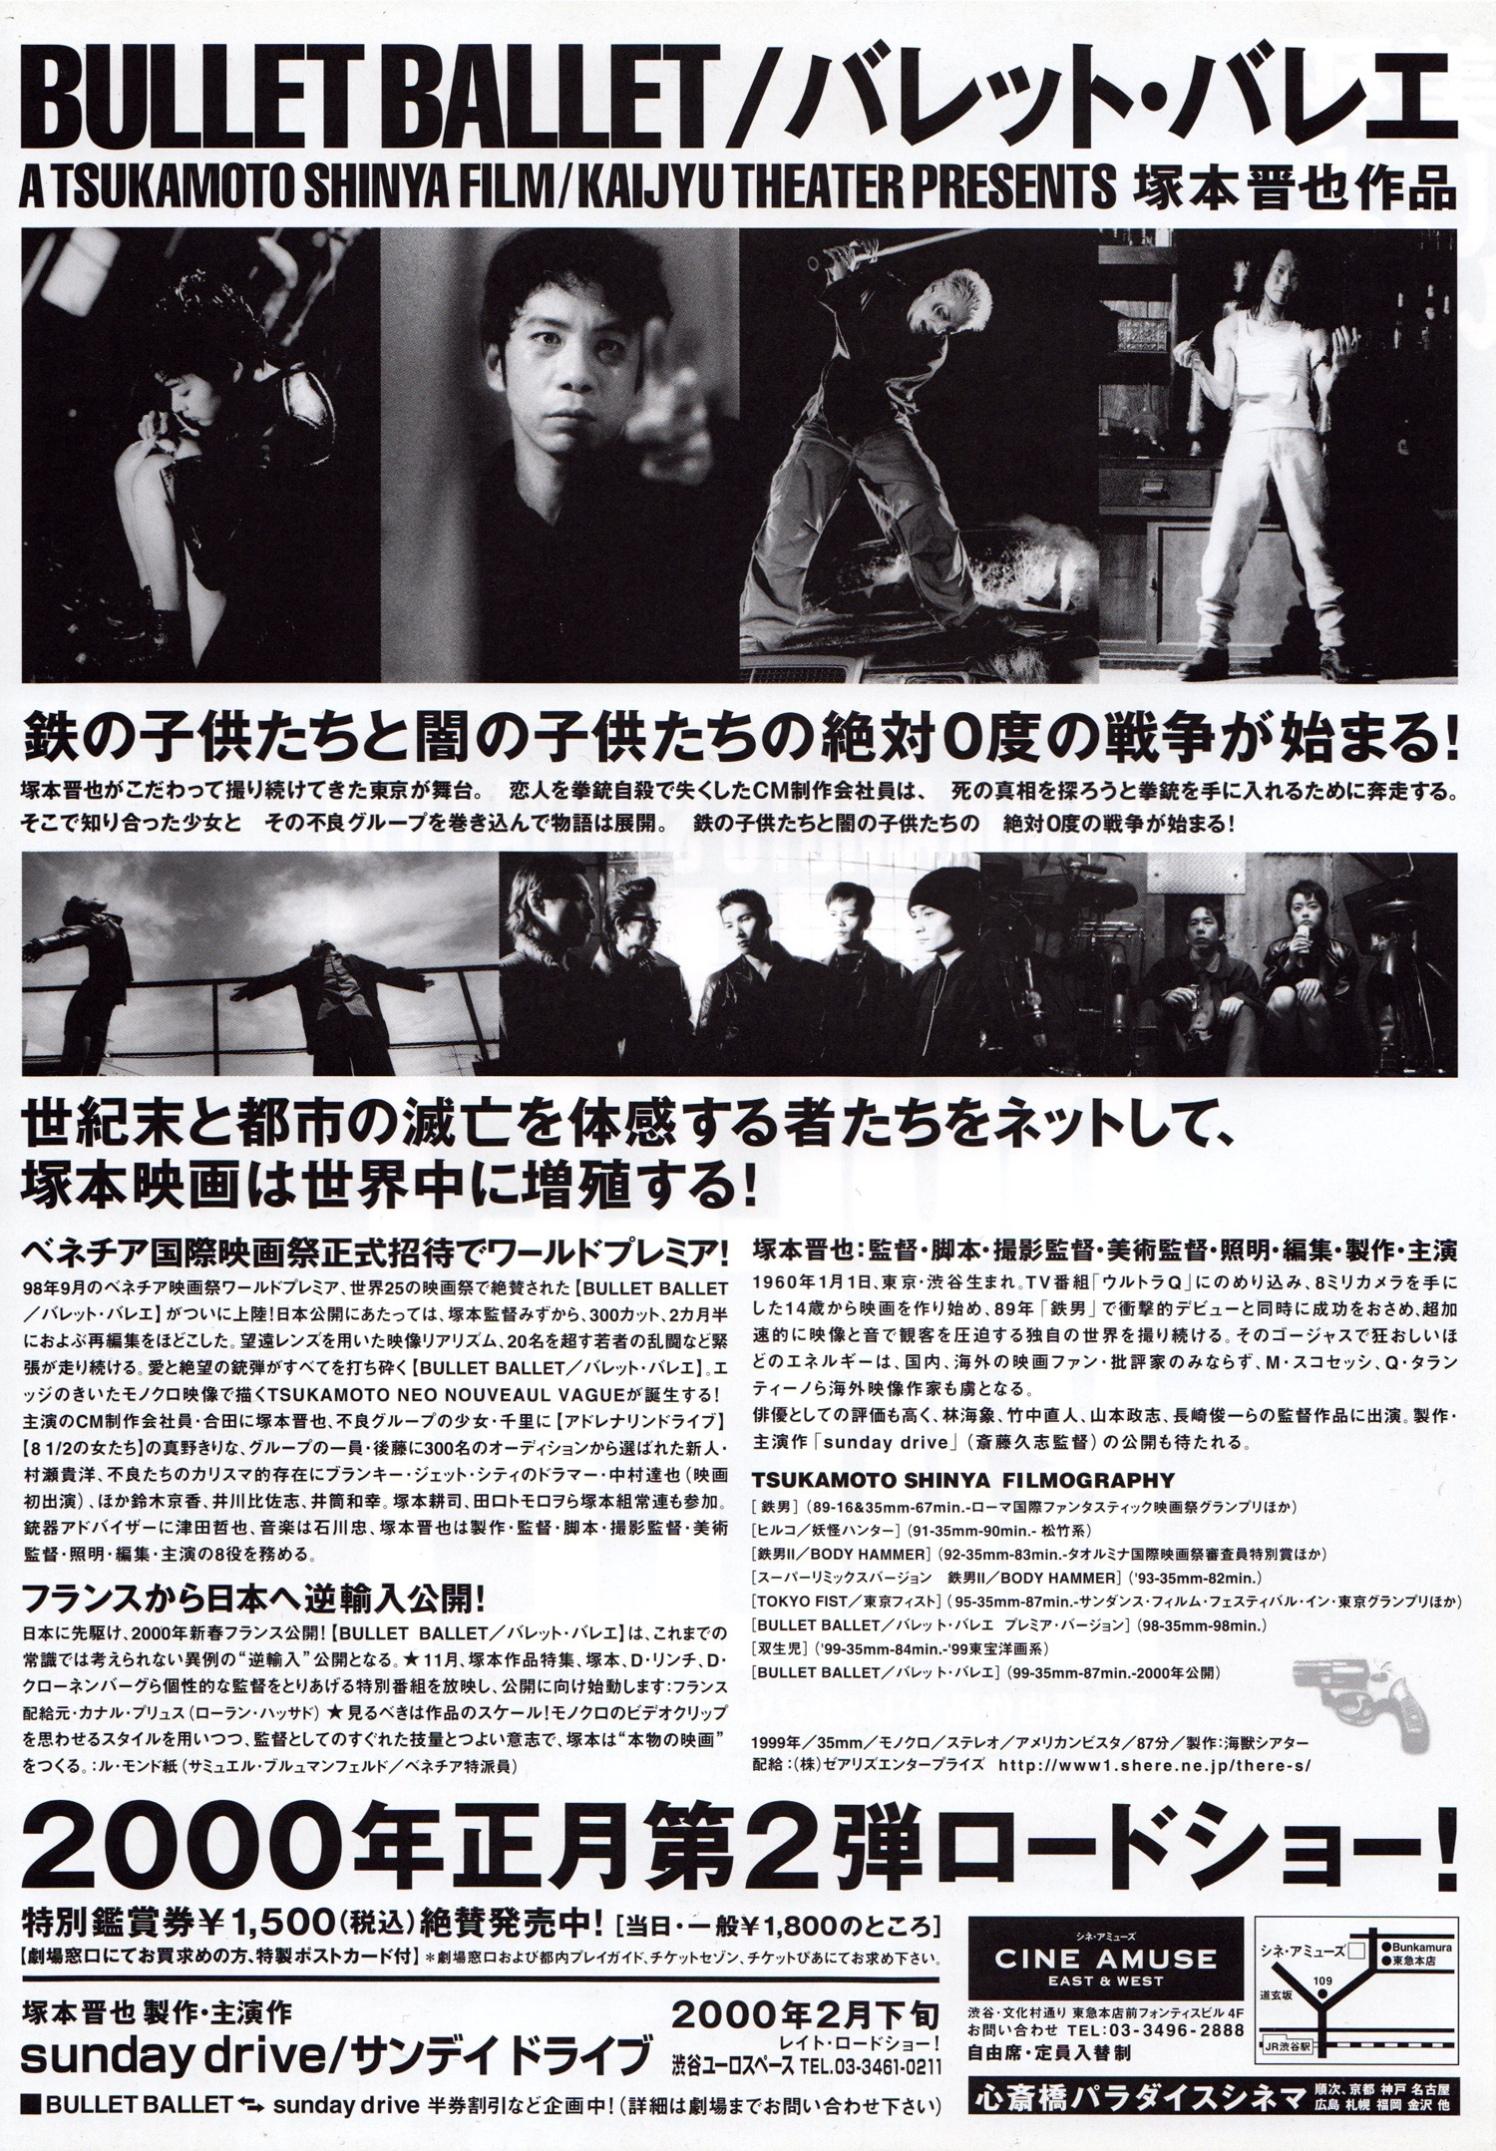 bulletballet_japan-2